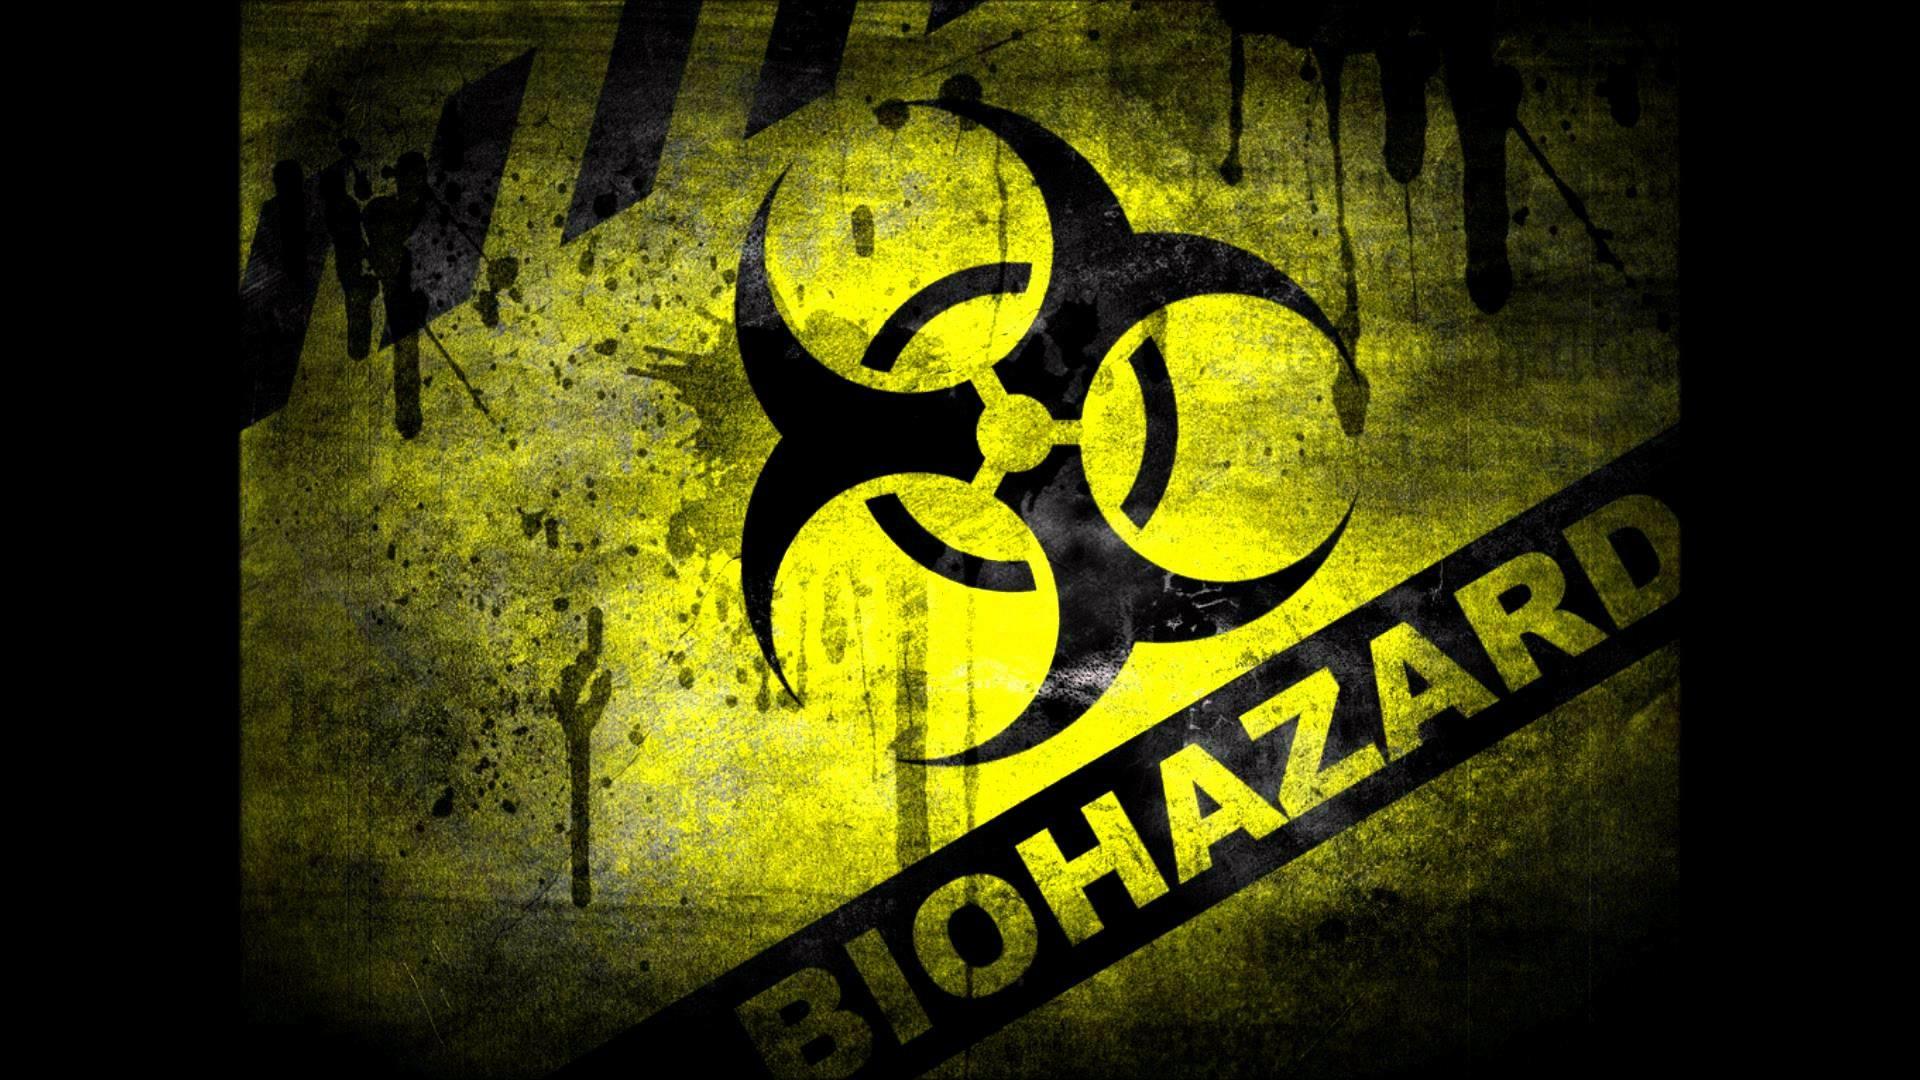 Biohazard Symbol Wallpaper 61 Images